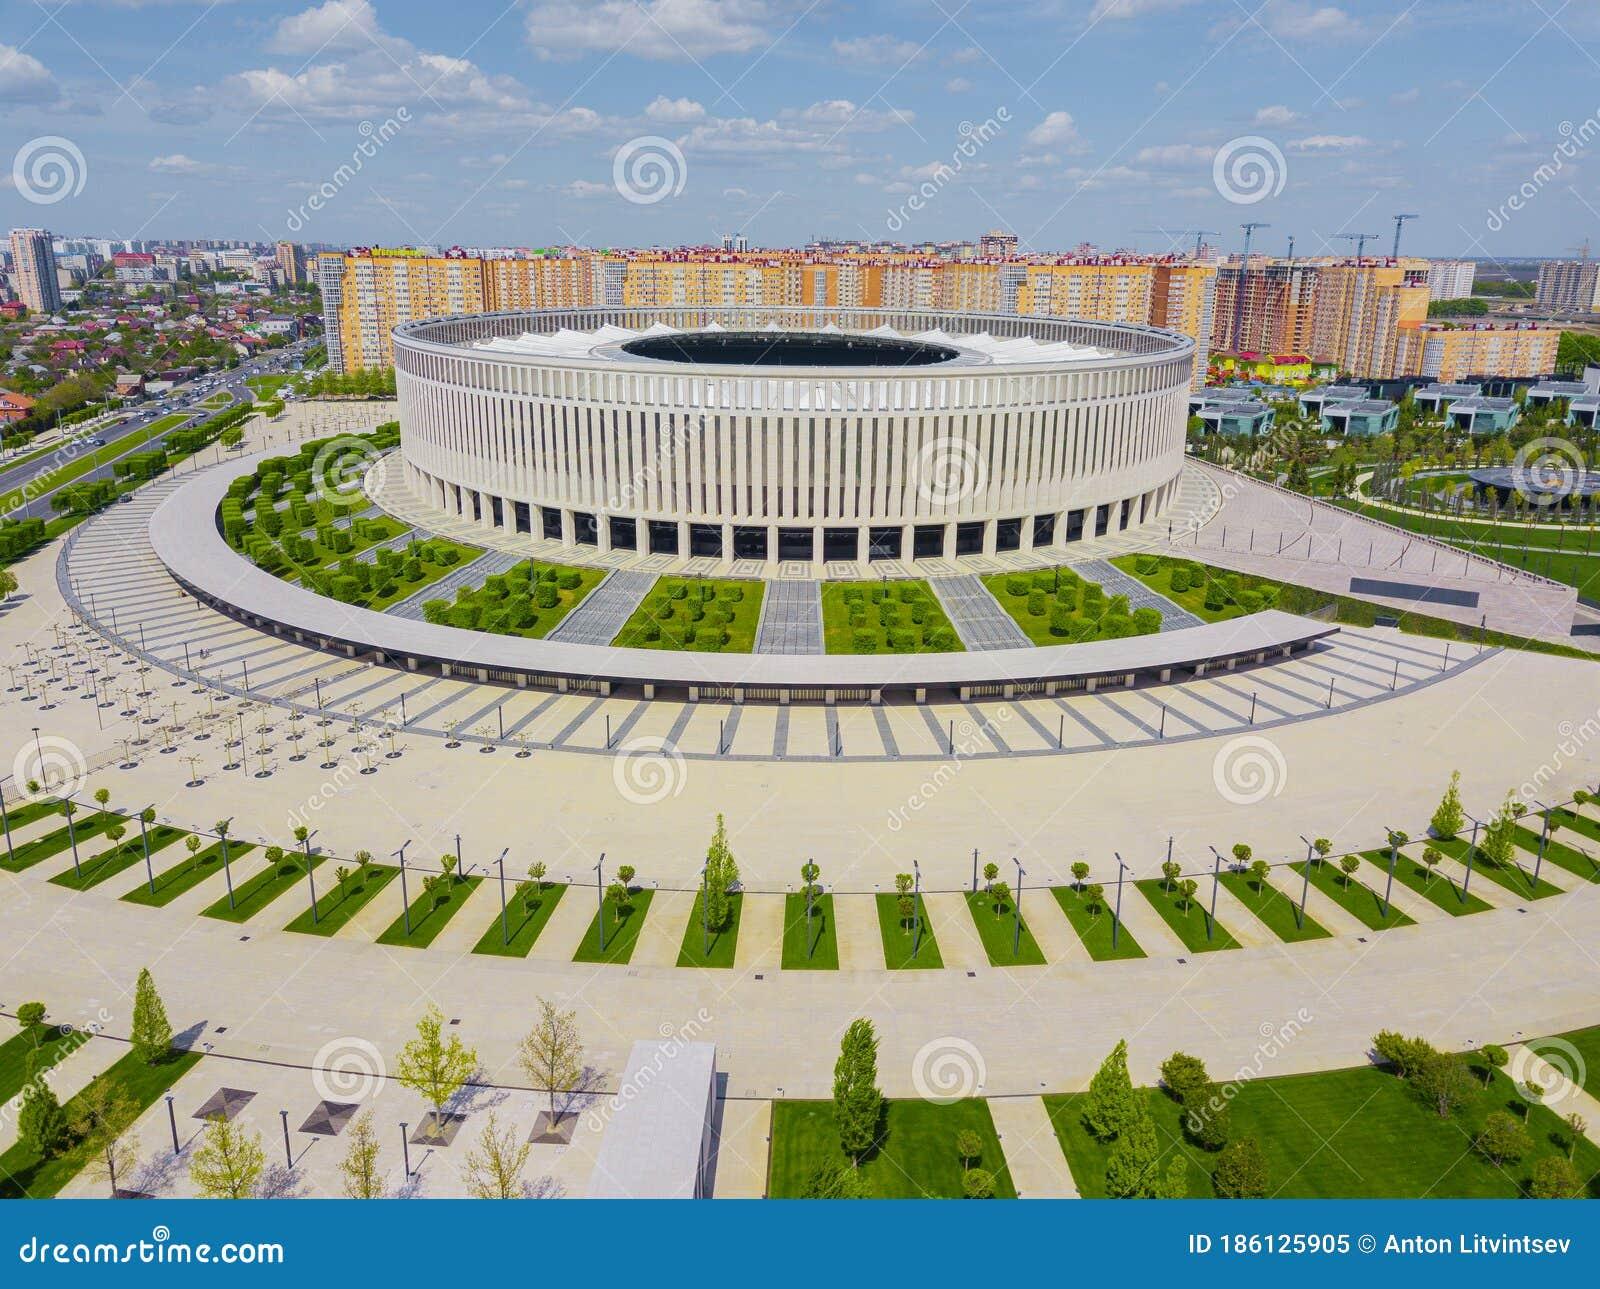 Krasnodar Russia April 2020 Aerial View Of Fc Krasnodar Stadium Editorial Image Image Of Cityscape Europe 186125905